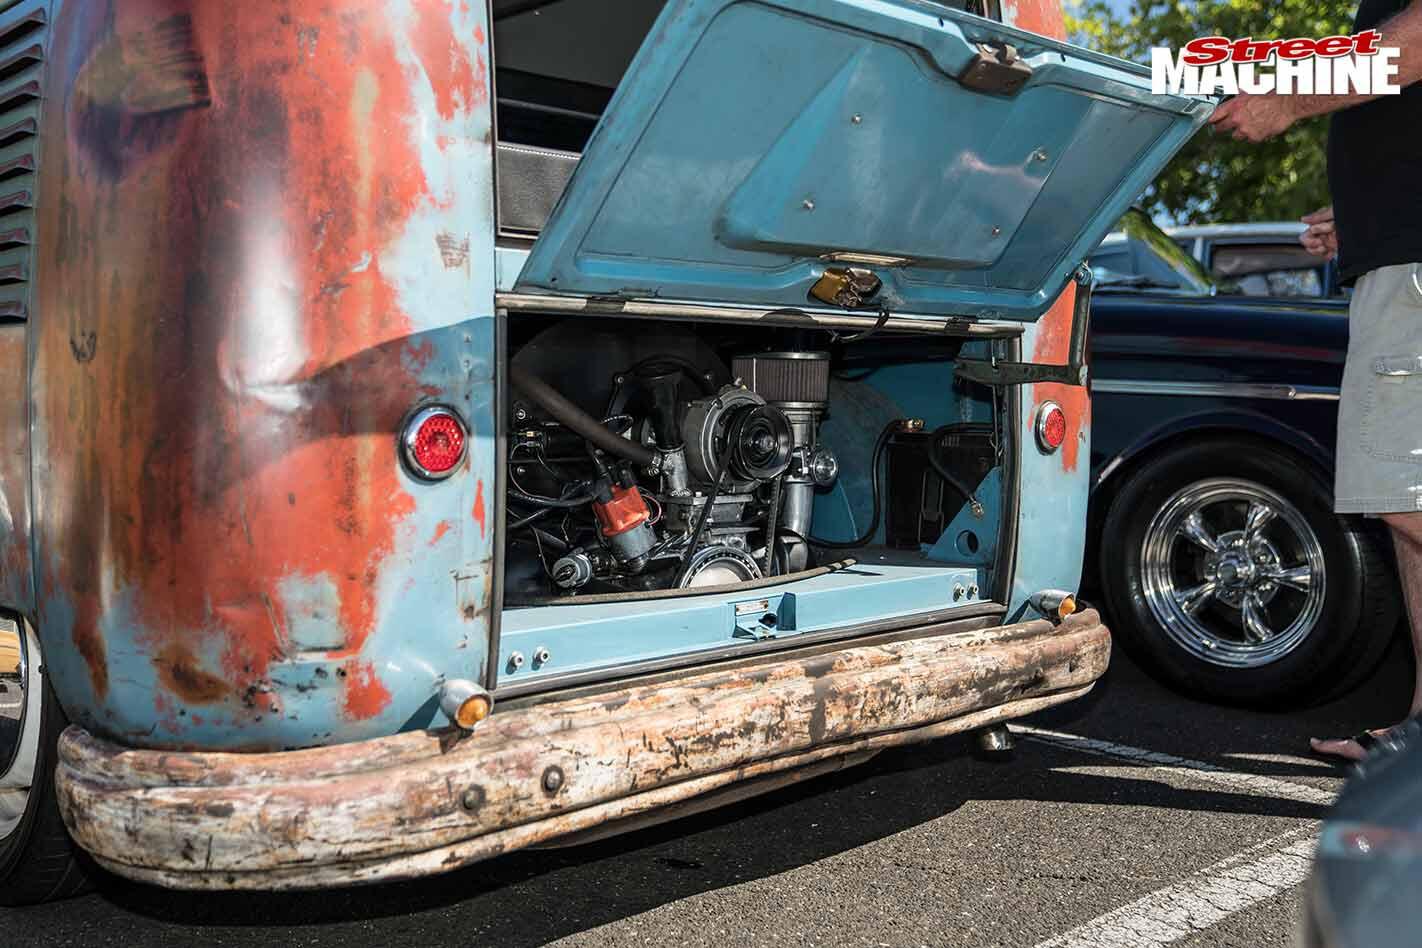 VW Kombi engine